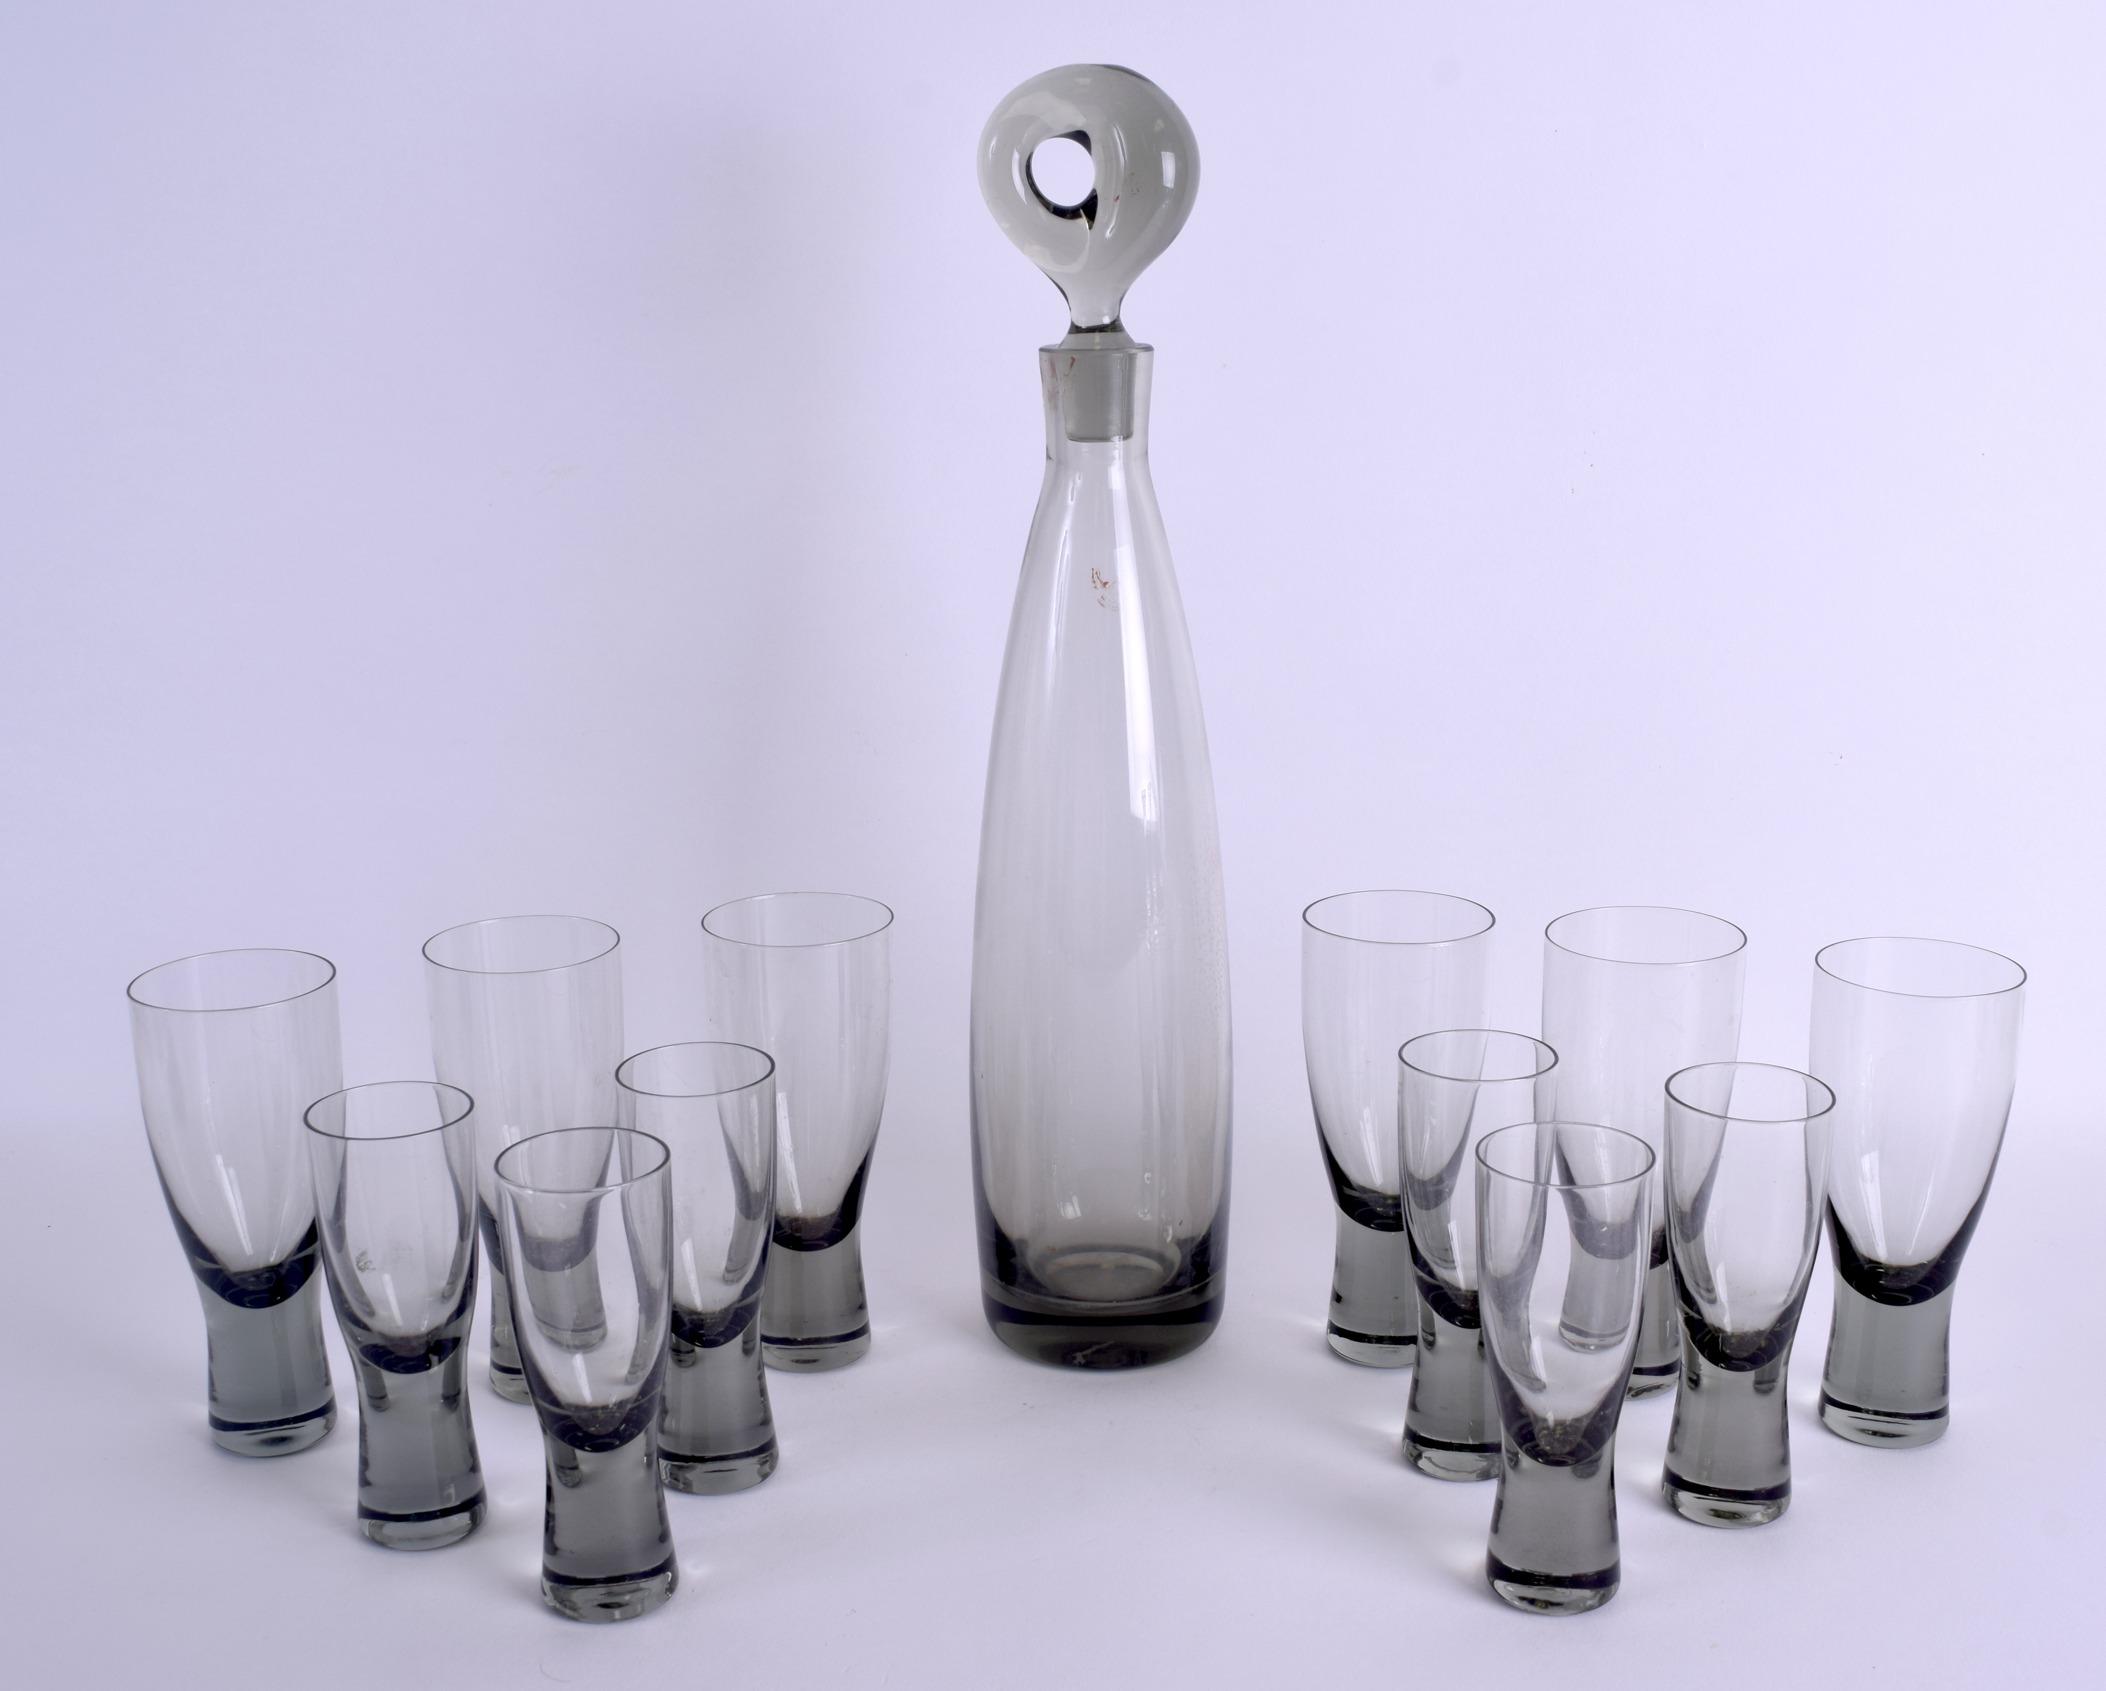 Lot 17 - A 1960's SCANDANAVIAN ARISTOCRAT DECANTER AND GLASSES designed by Per Lutkin. Decanter 38 cm